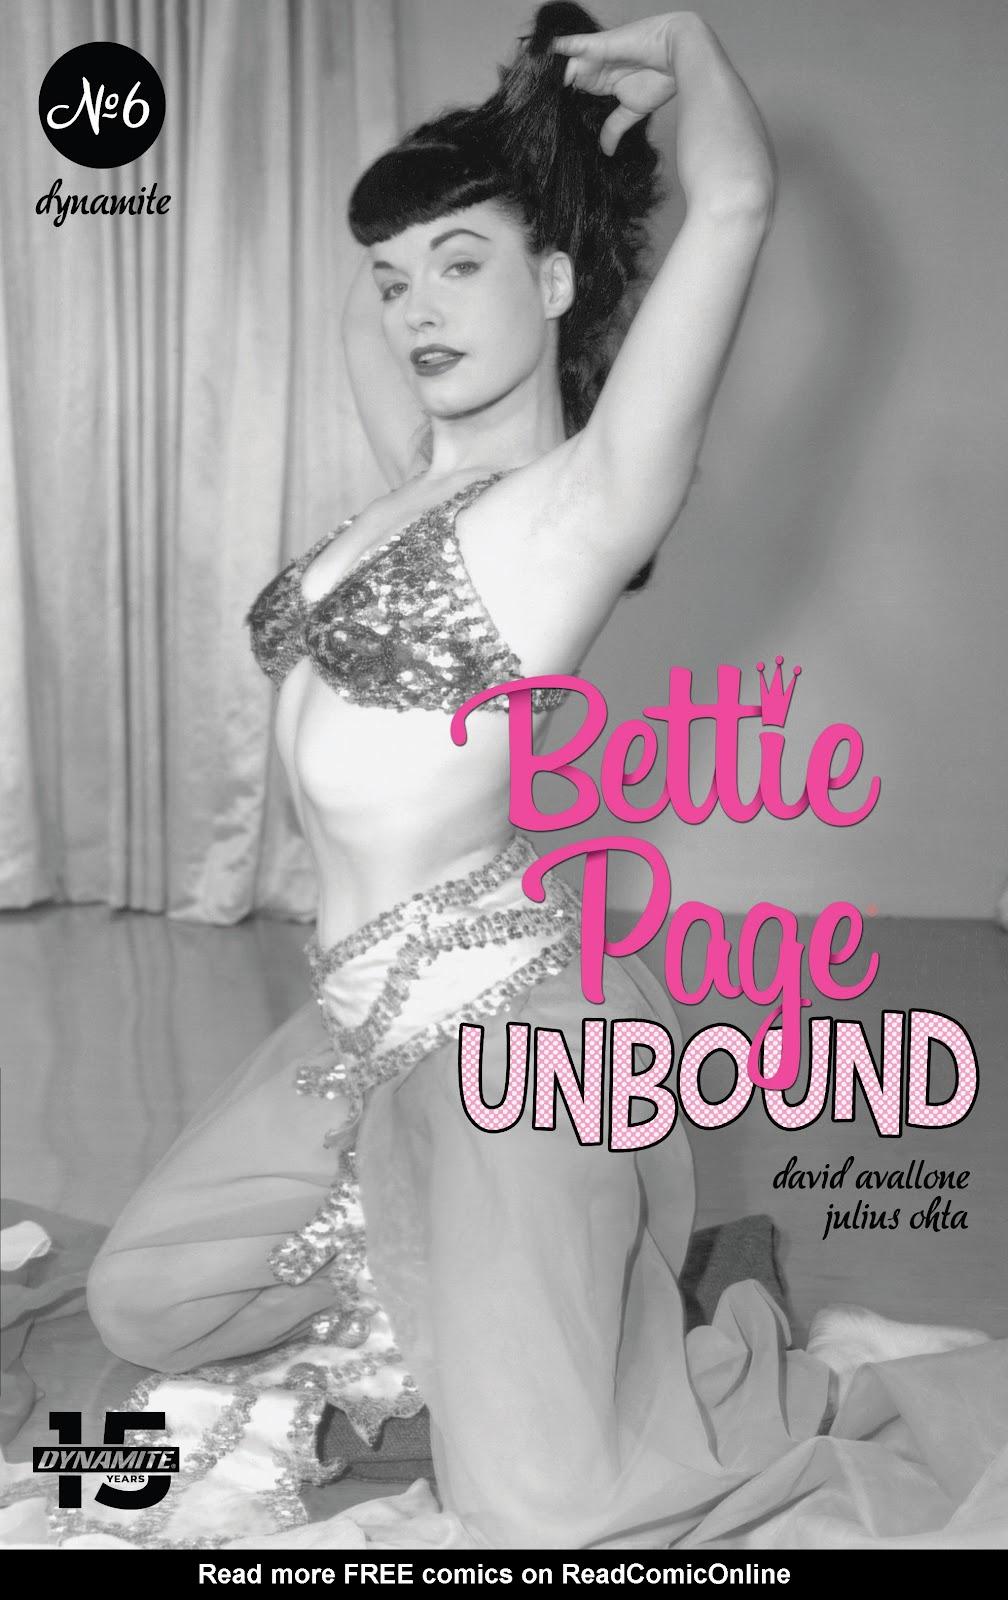 Read online Bettie Page: Unbound comic -  Issue #6 - 5